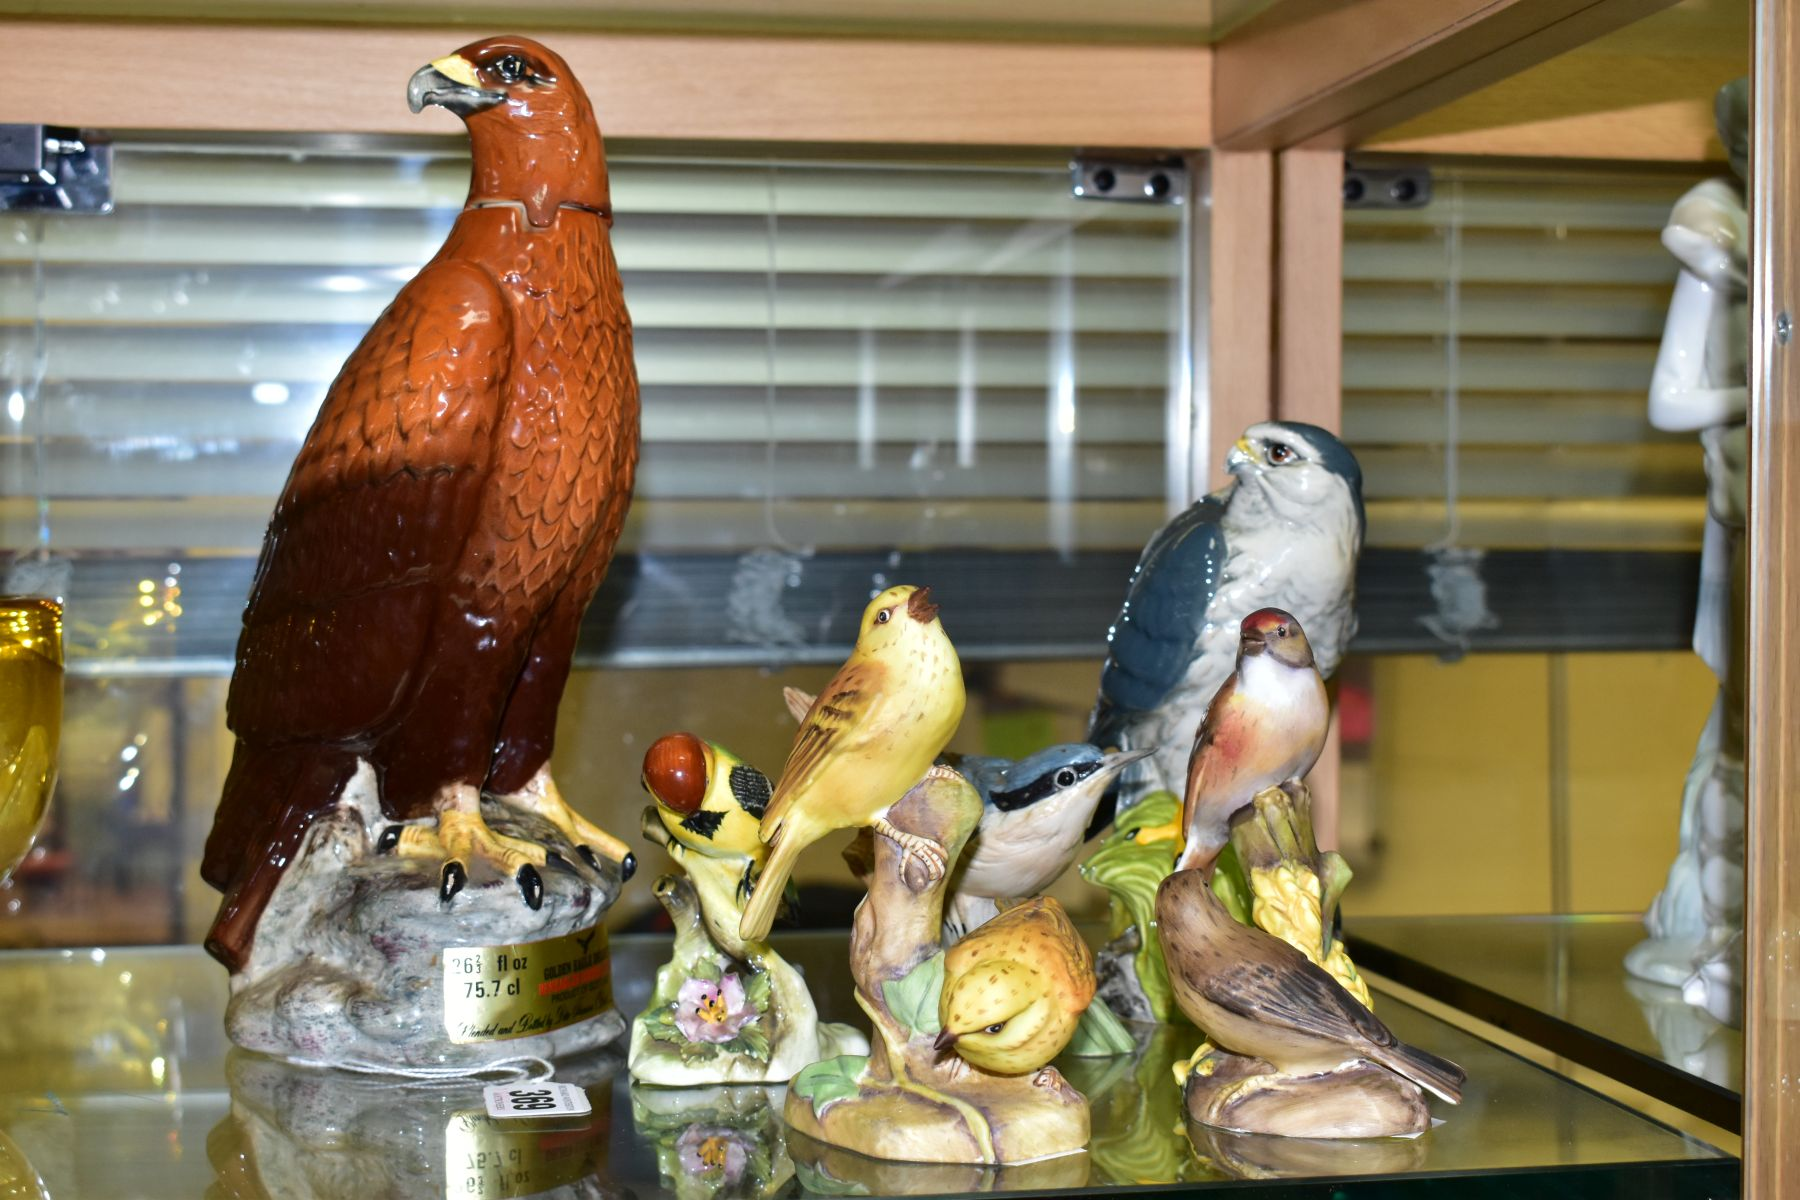 SIX VARIOUS ORNAMENTAL BIRDS, comprising a Beswick 'Golden Eagle Decanter' for Beneagles Scotch